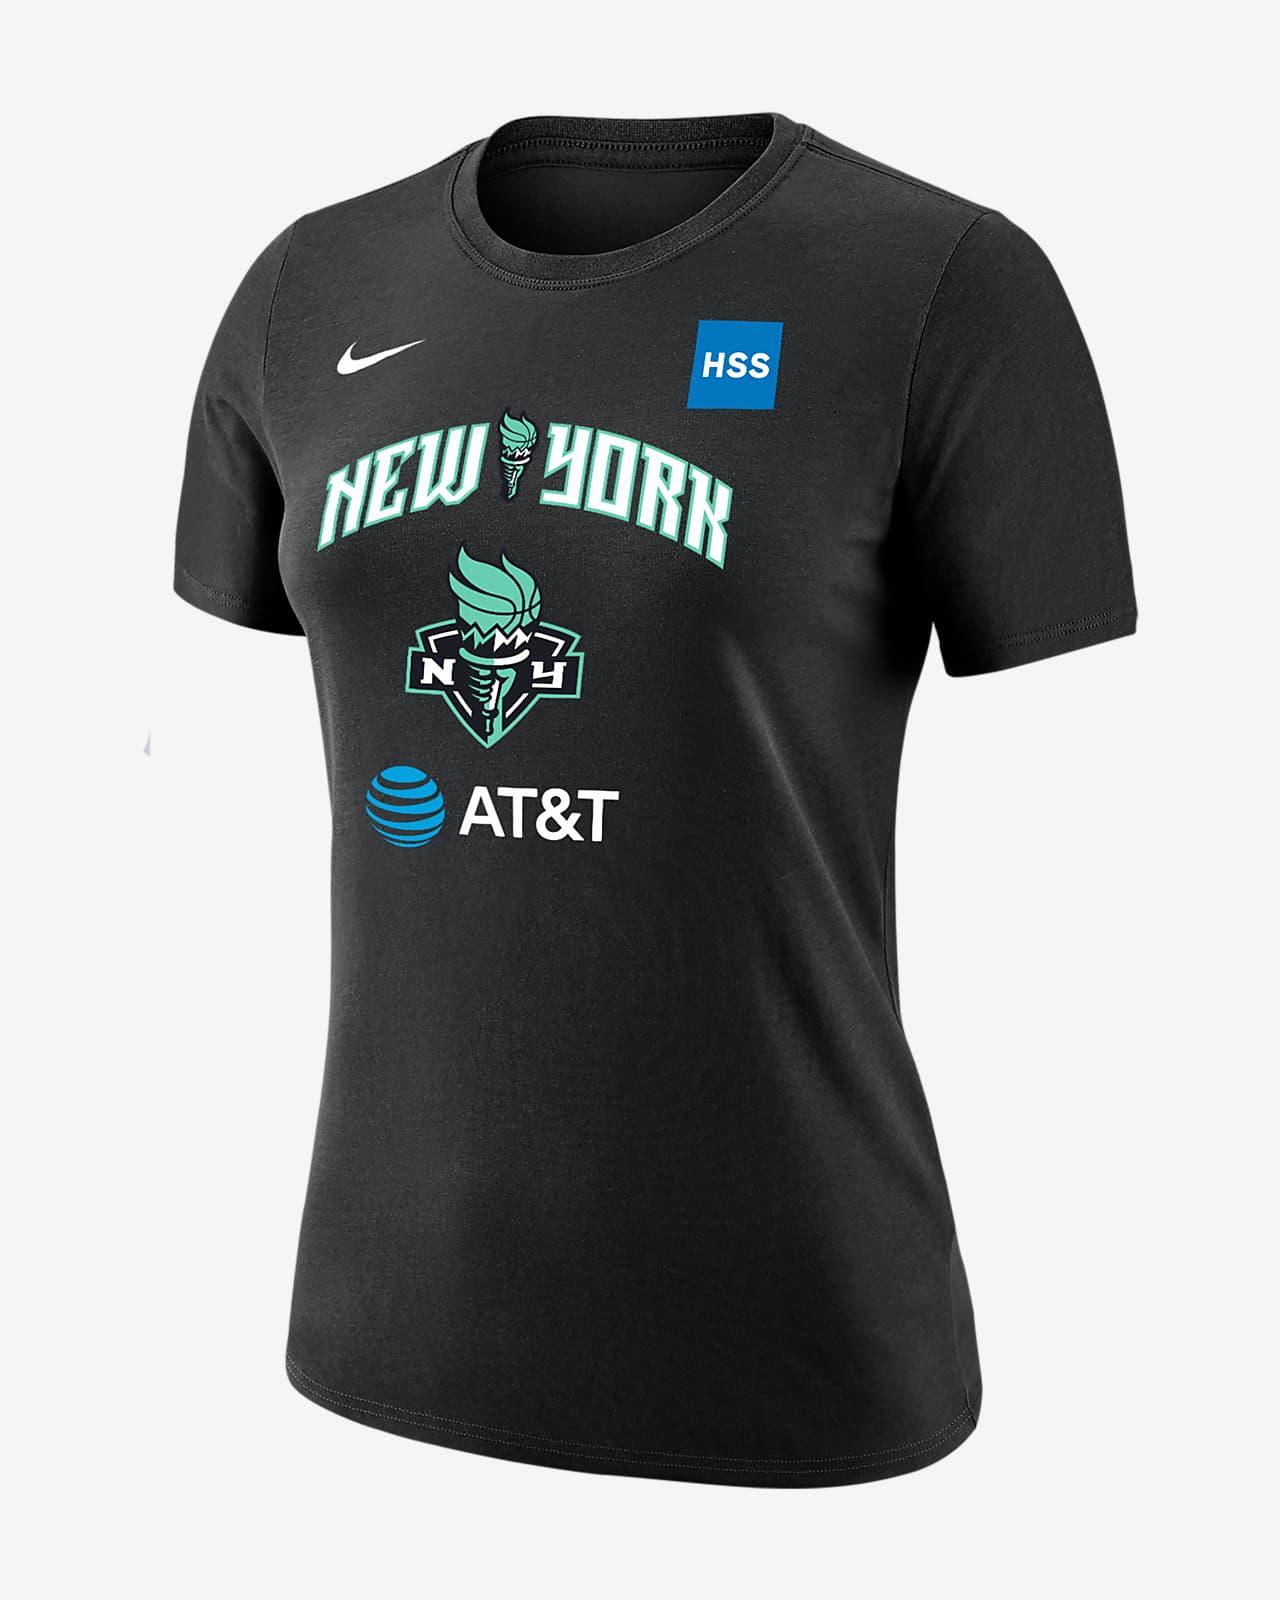 Sabrina Ionescu New York Liberty Women's Nike WNBA T-Shirt